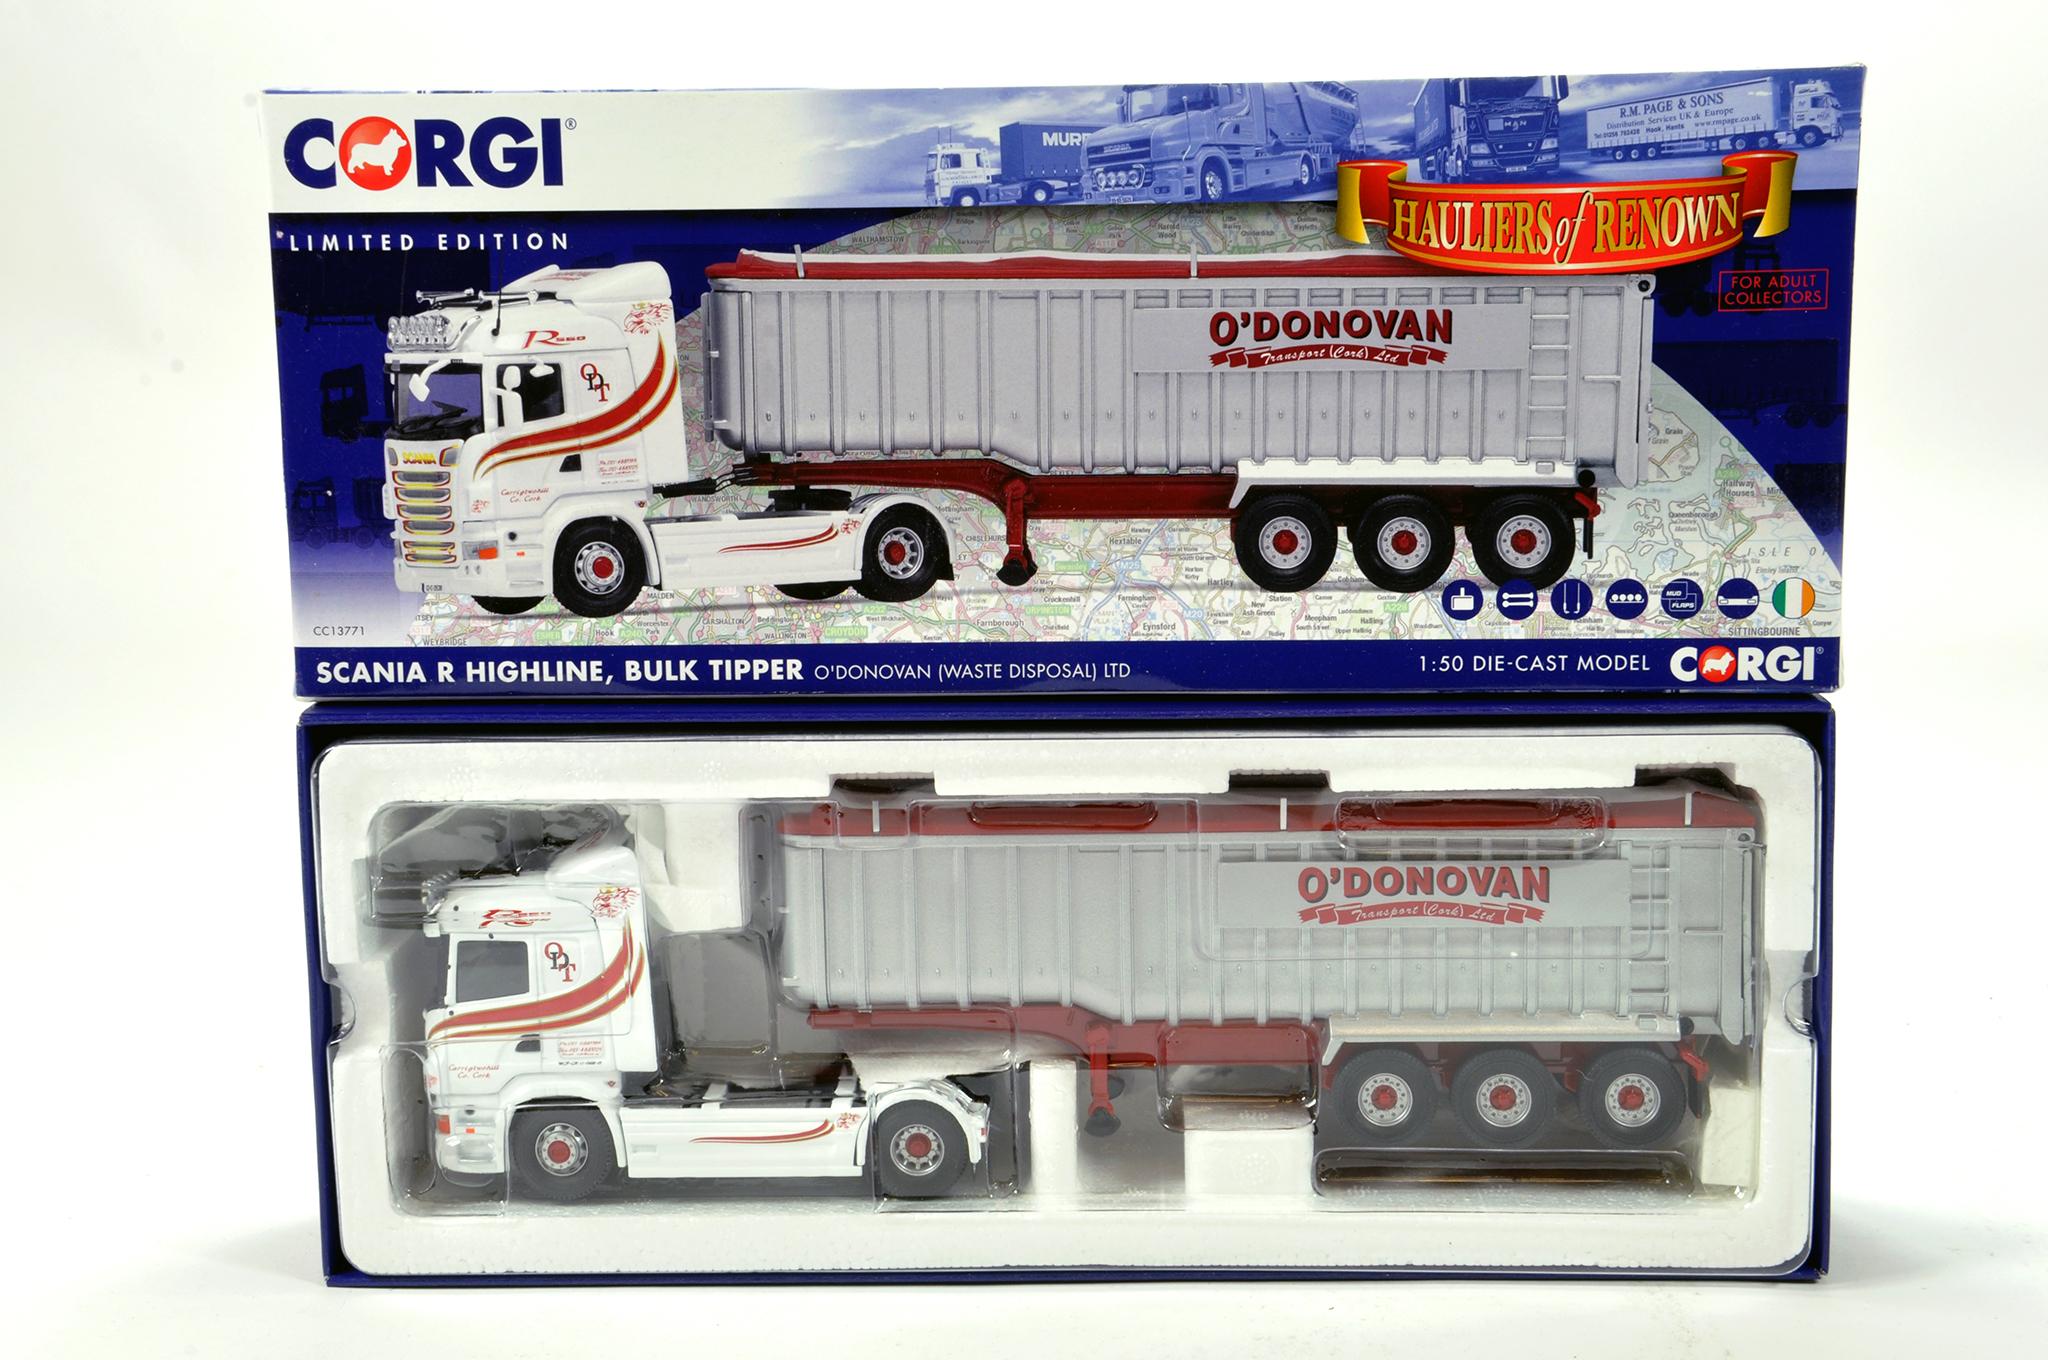 Lot 47 - Corgi 1/50 diecast truck issue comprising No. CC13771 Scania R Highline Bulk Tipper in livery of O'